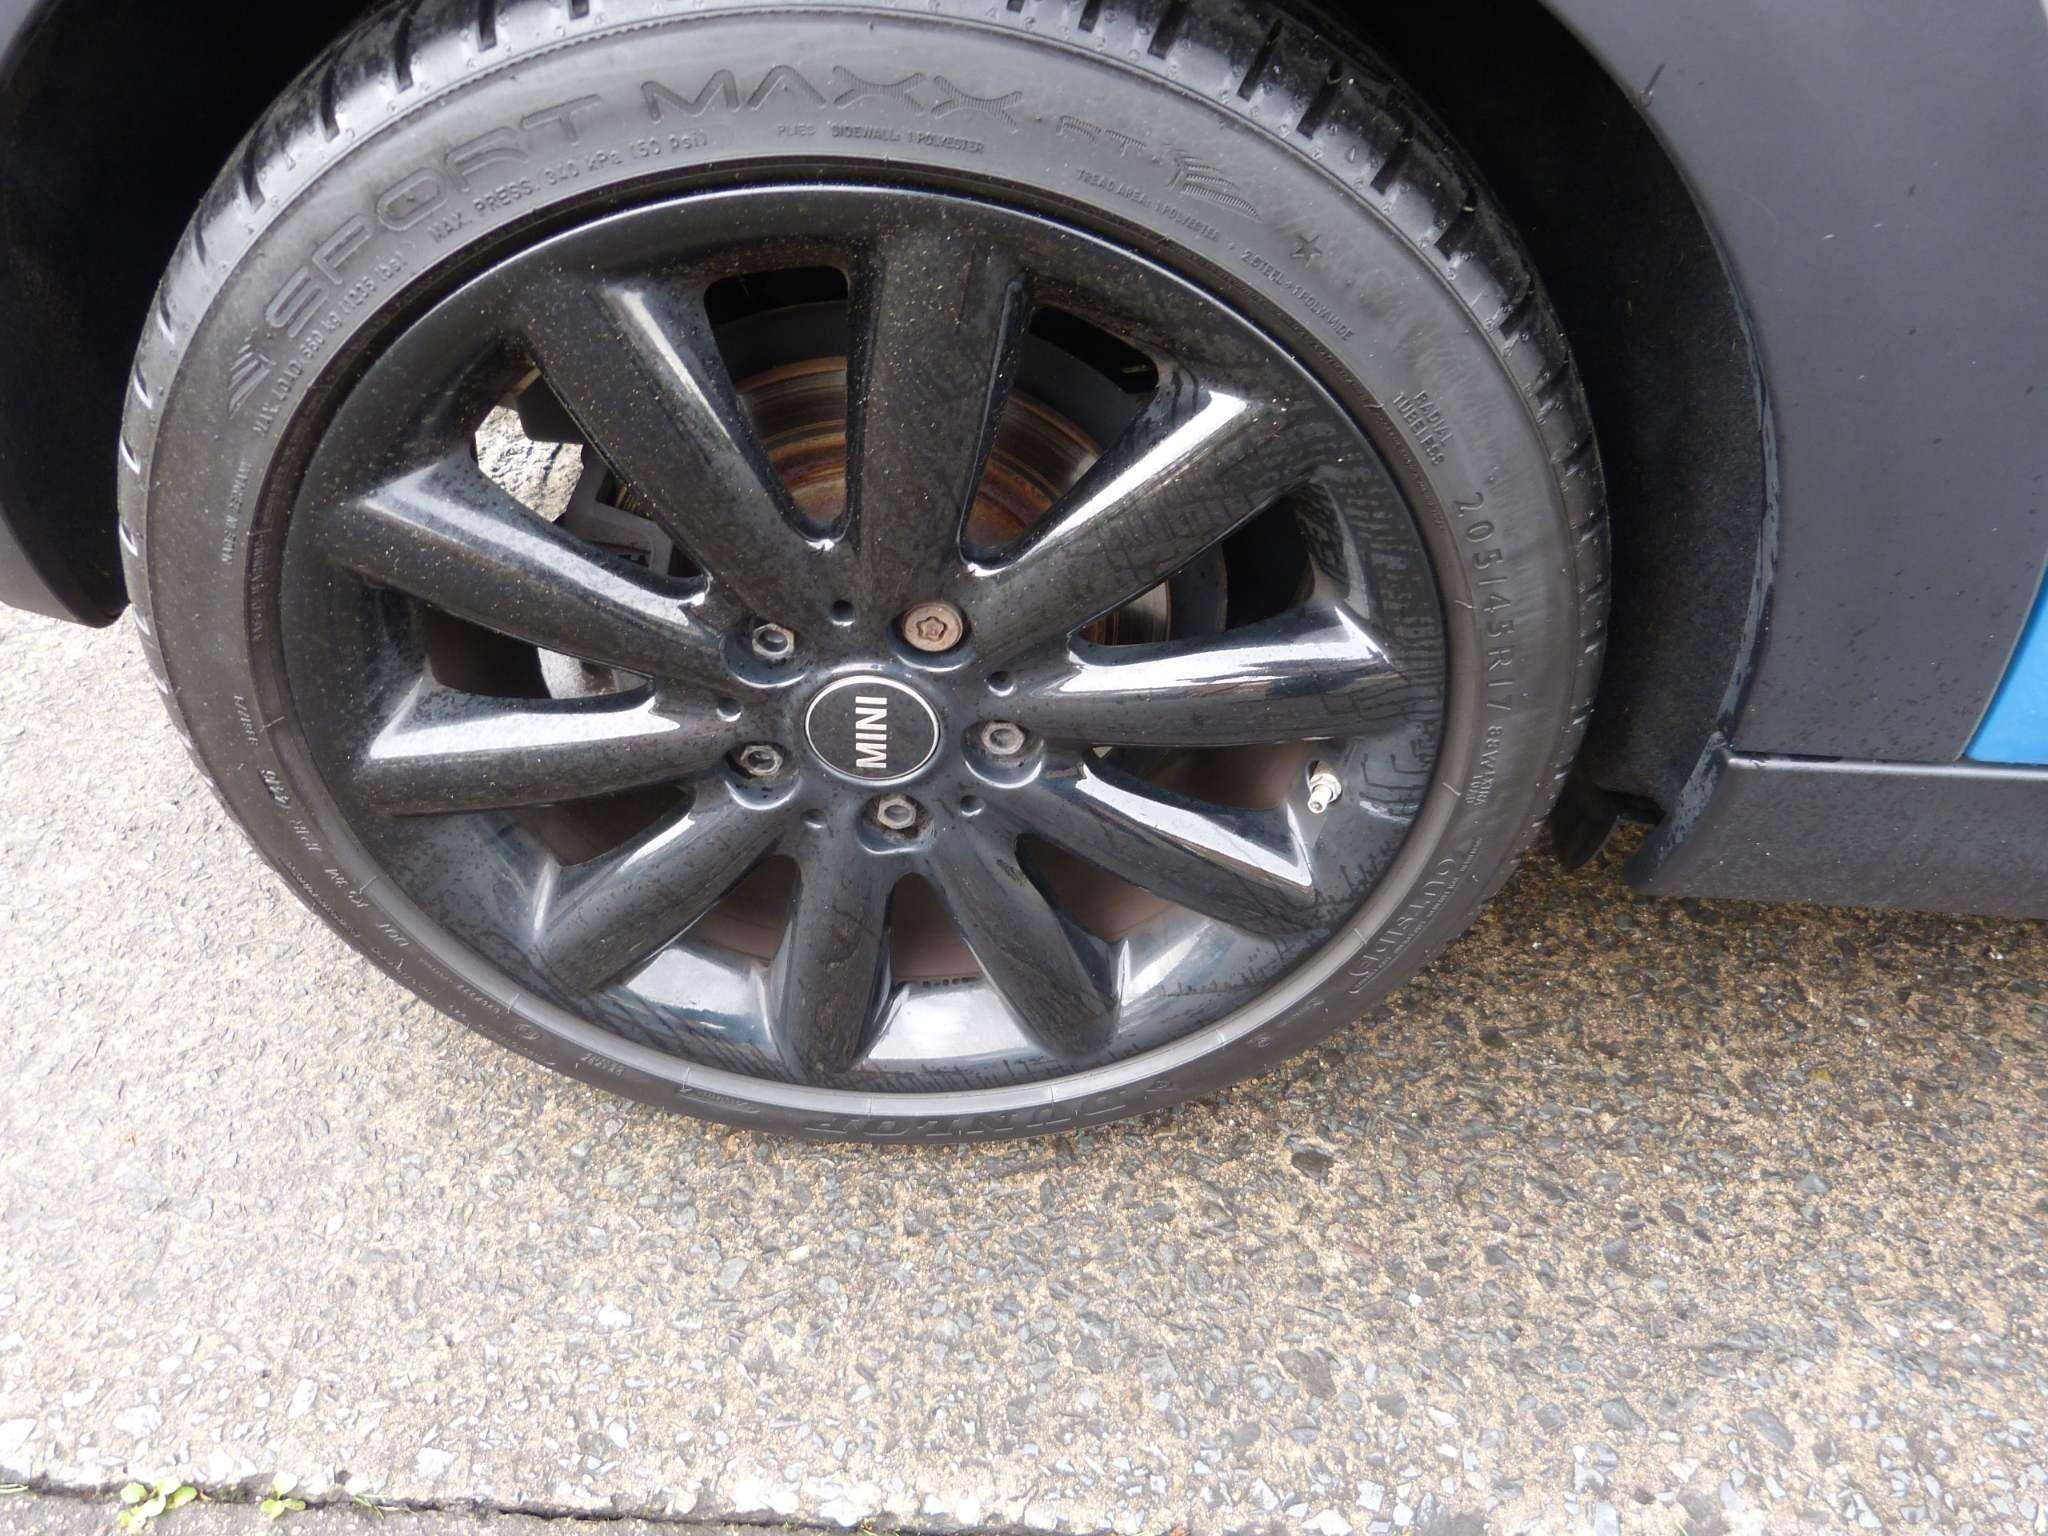 2017 MINI Hatch 1.5 Cooper D (s/s) Diesel Manual  – Beechlawn Motors Belfast full